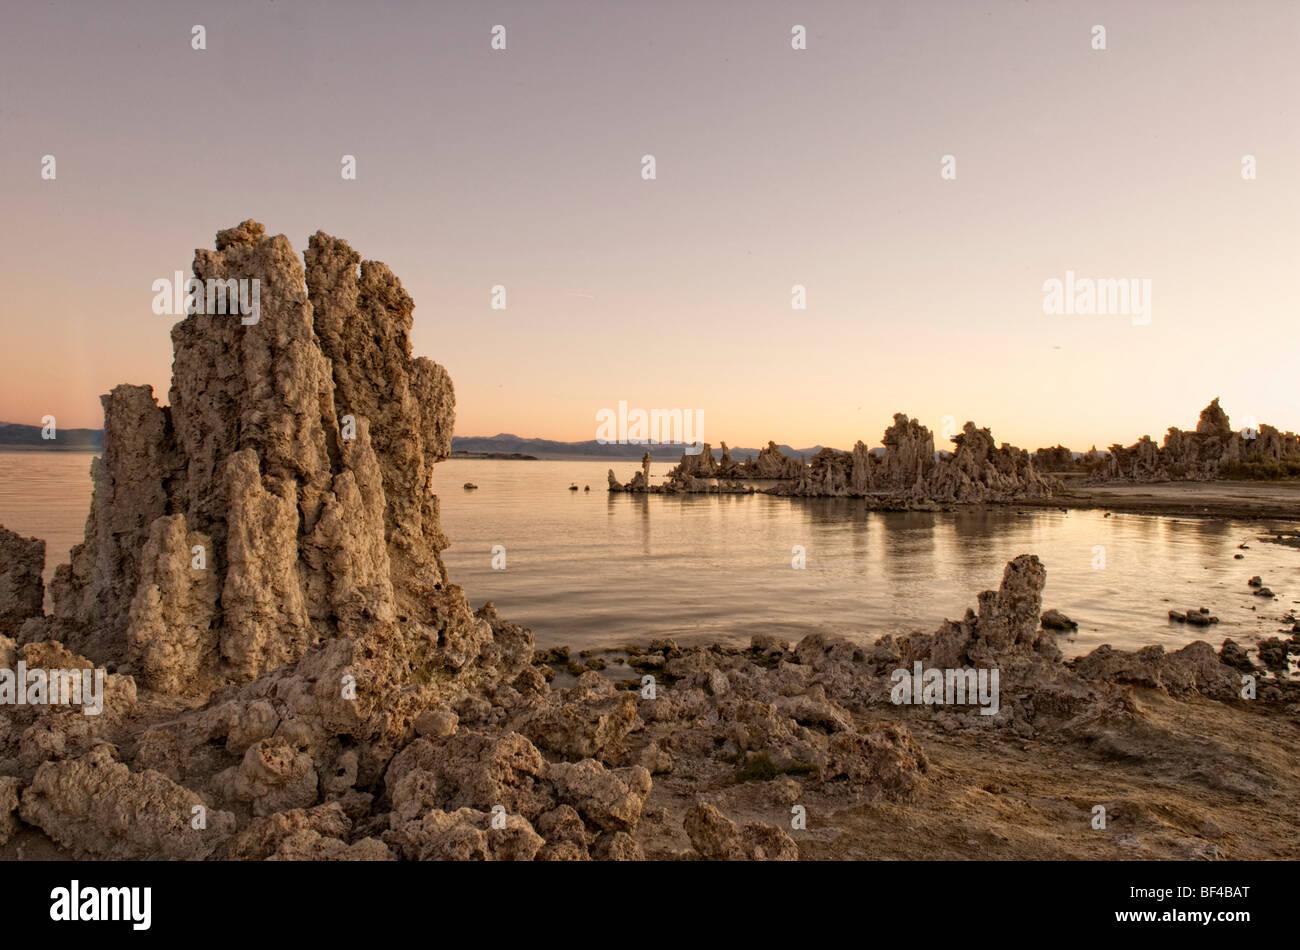 Sunrise at South Tufa, Mono Lake, Lee Vining, California, USA - Stock Image